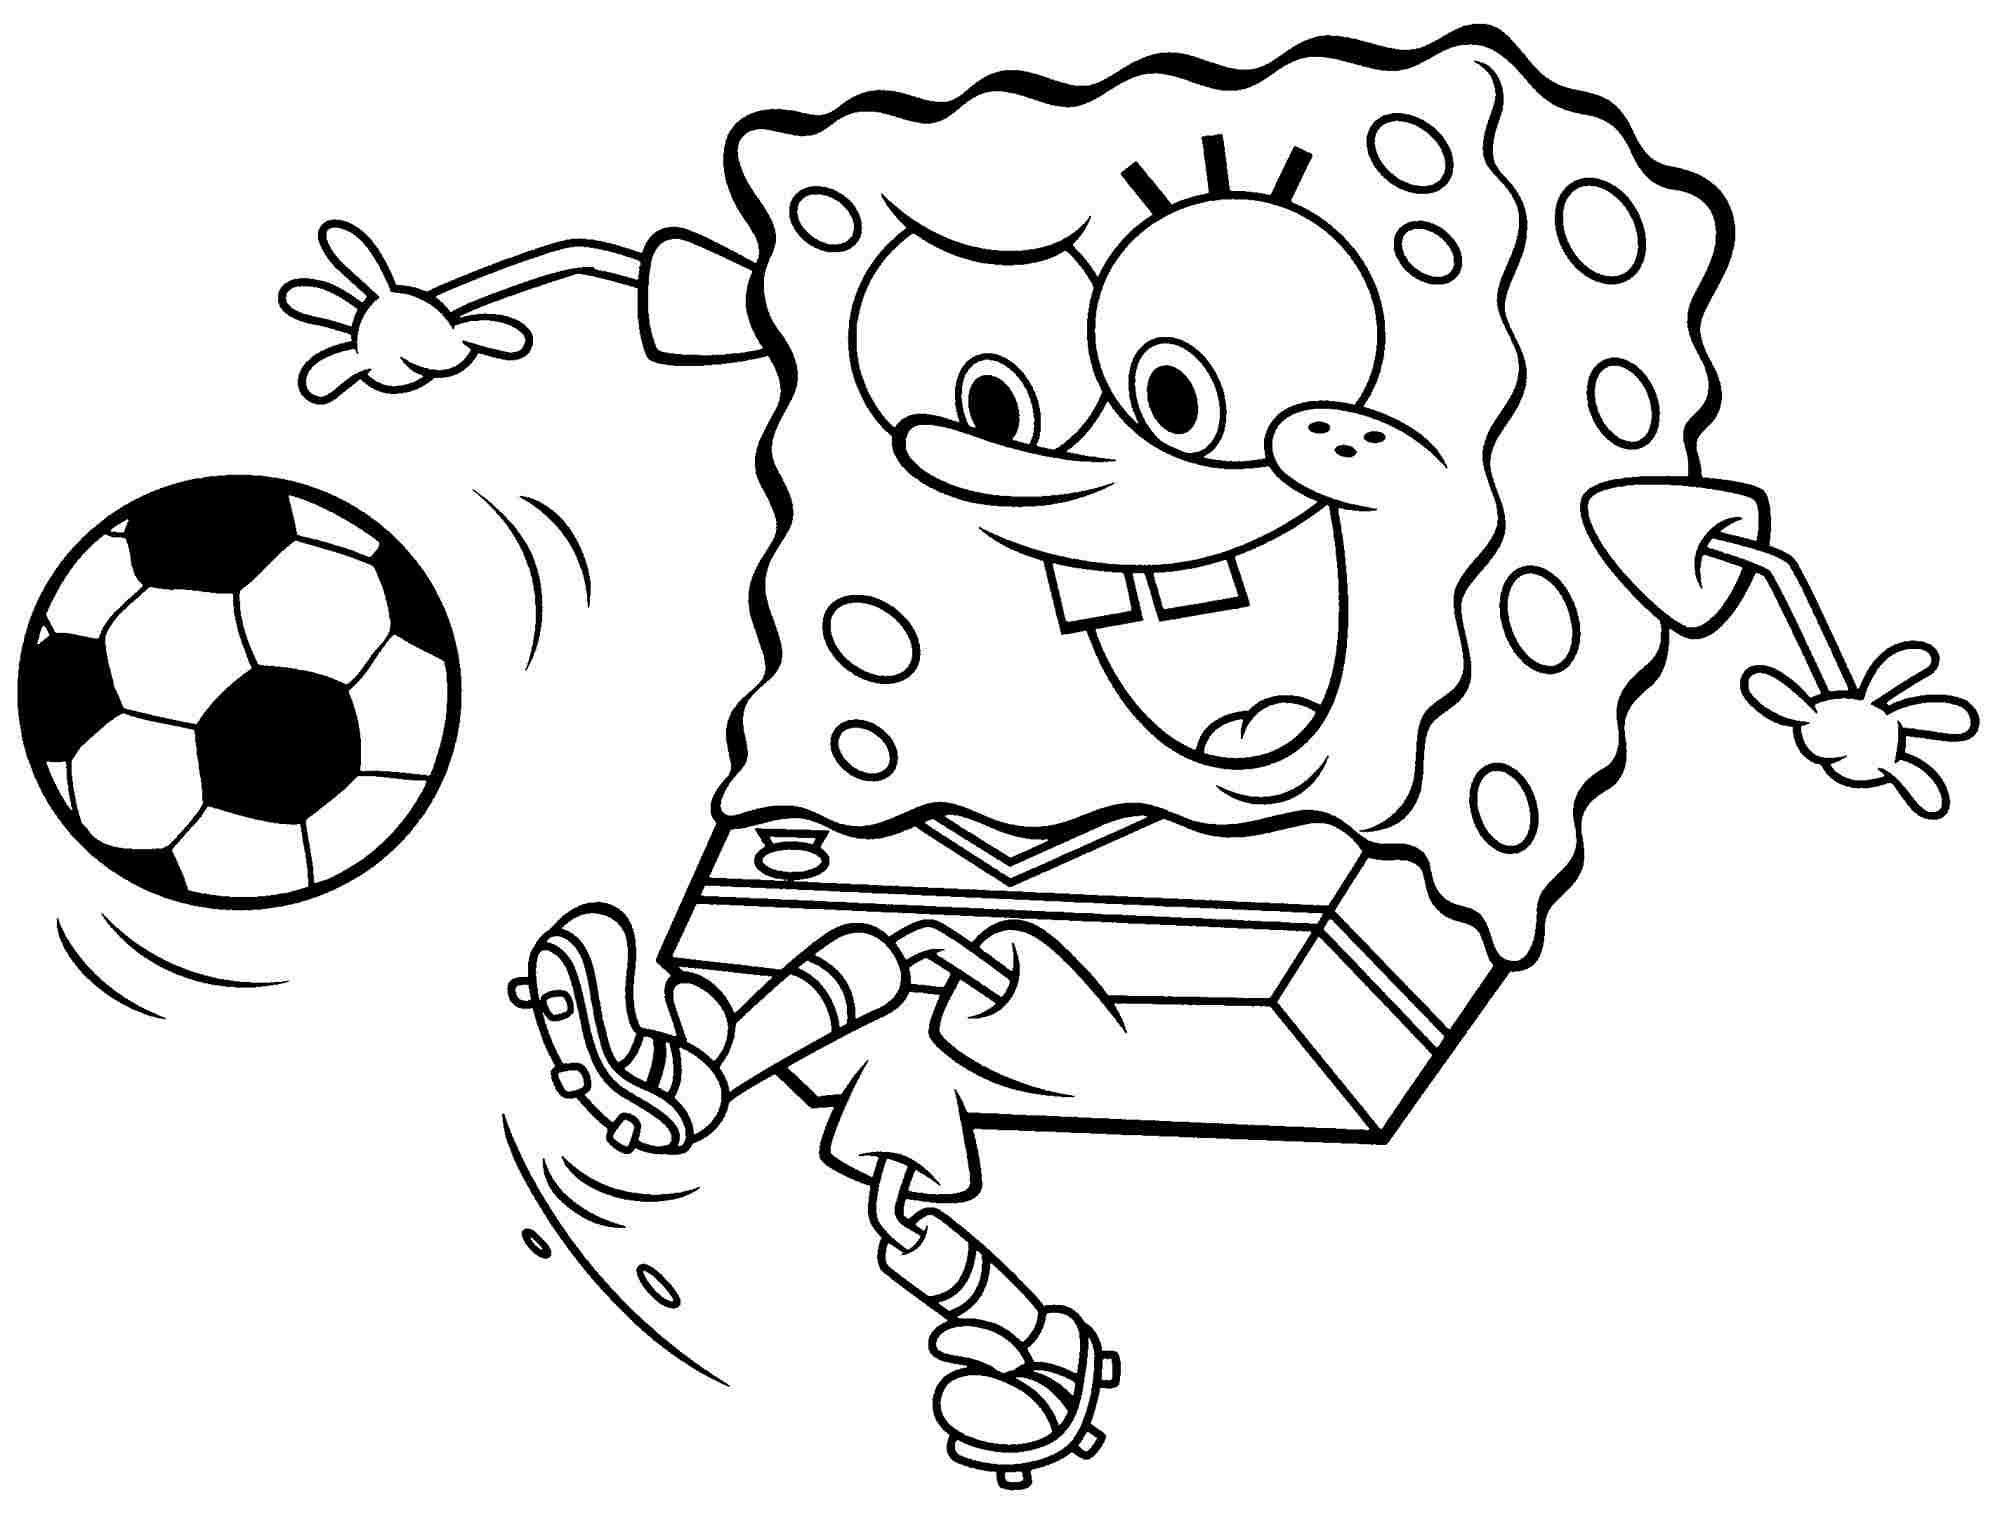 Best Spongebob Squarepants Memes Coloring Pages And